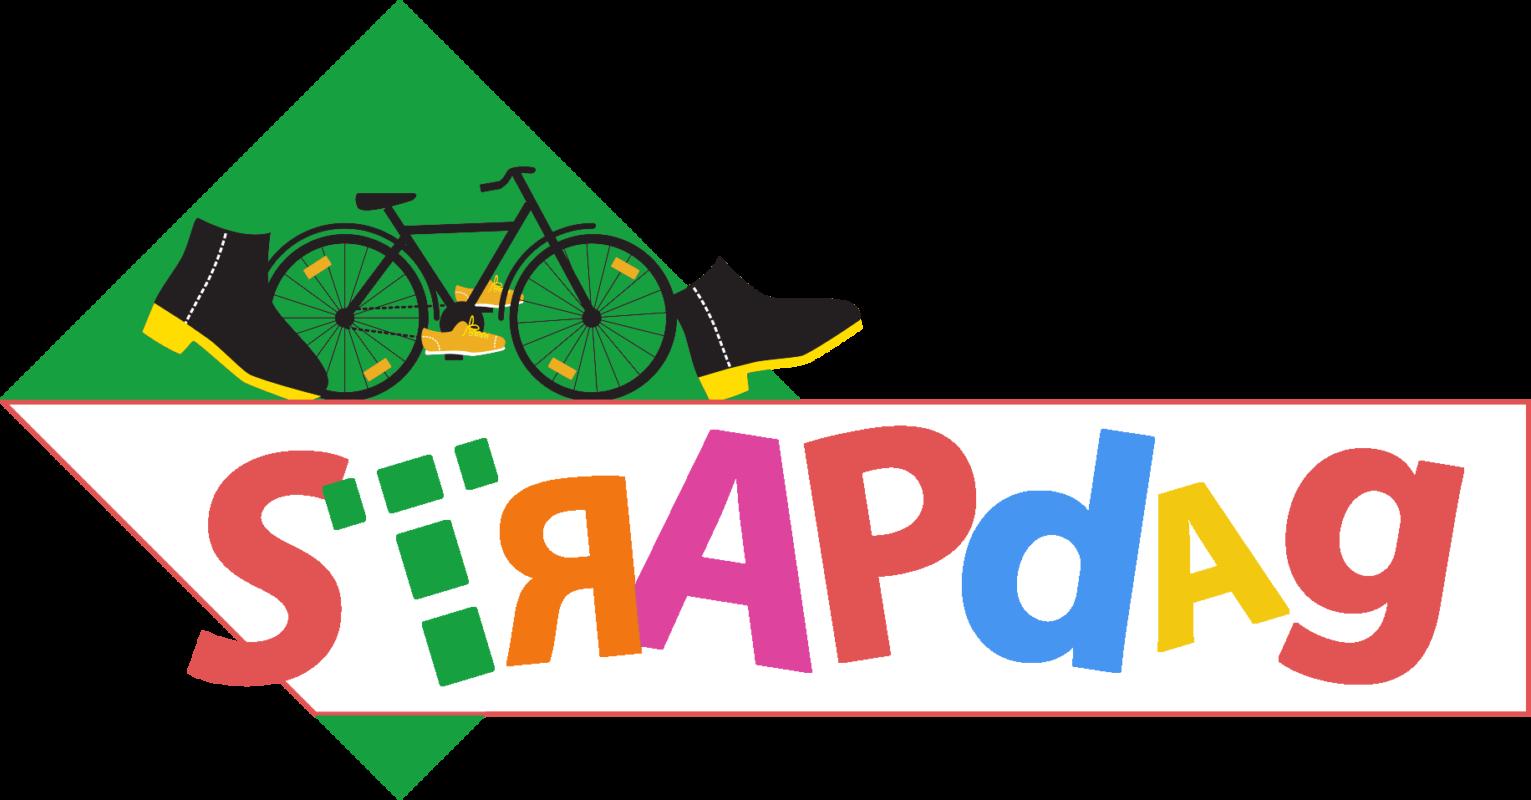 STRAPDAG_def